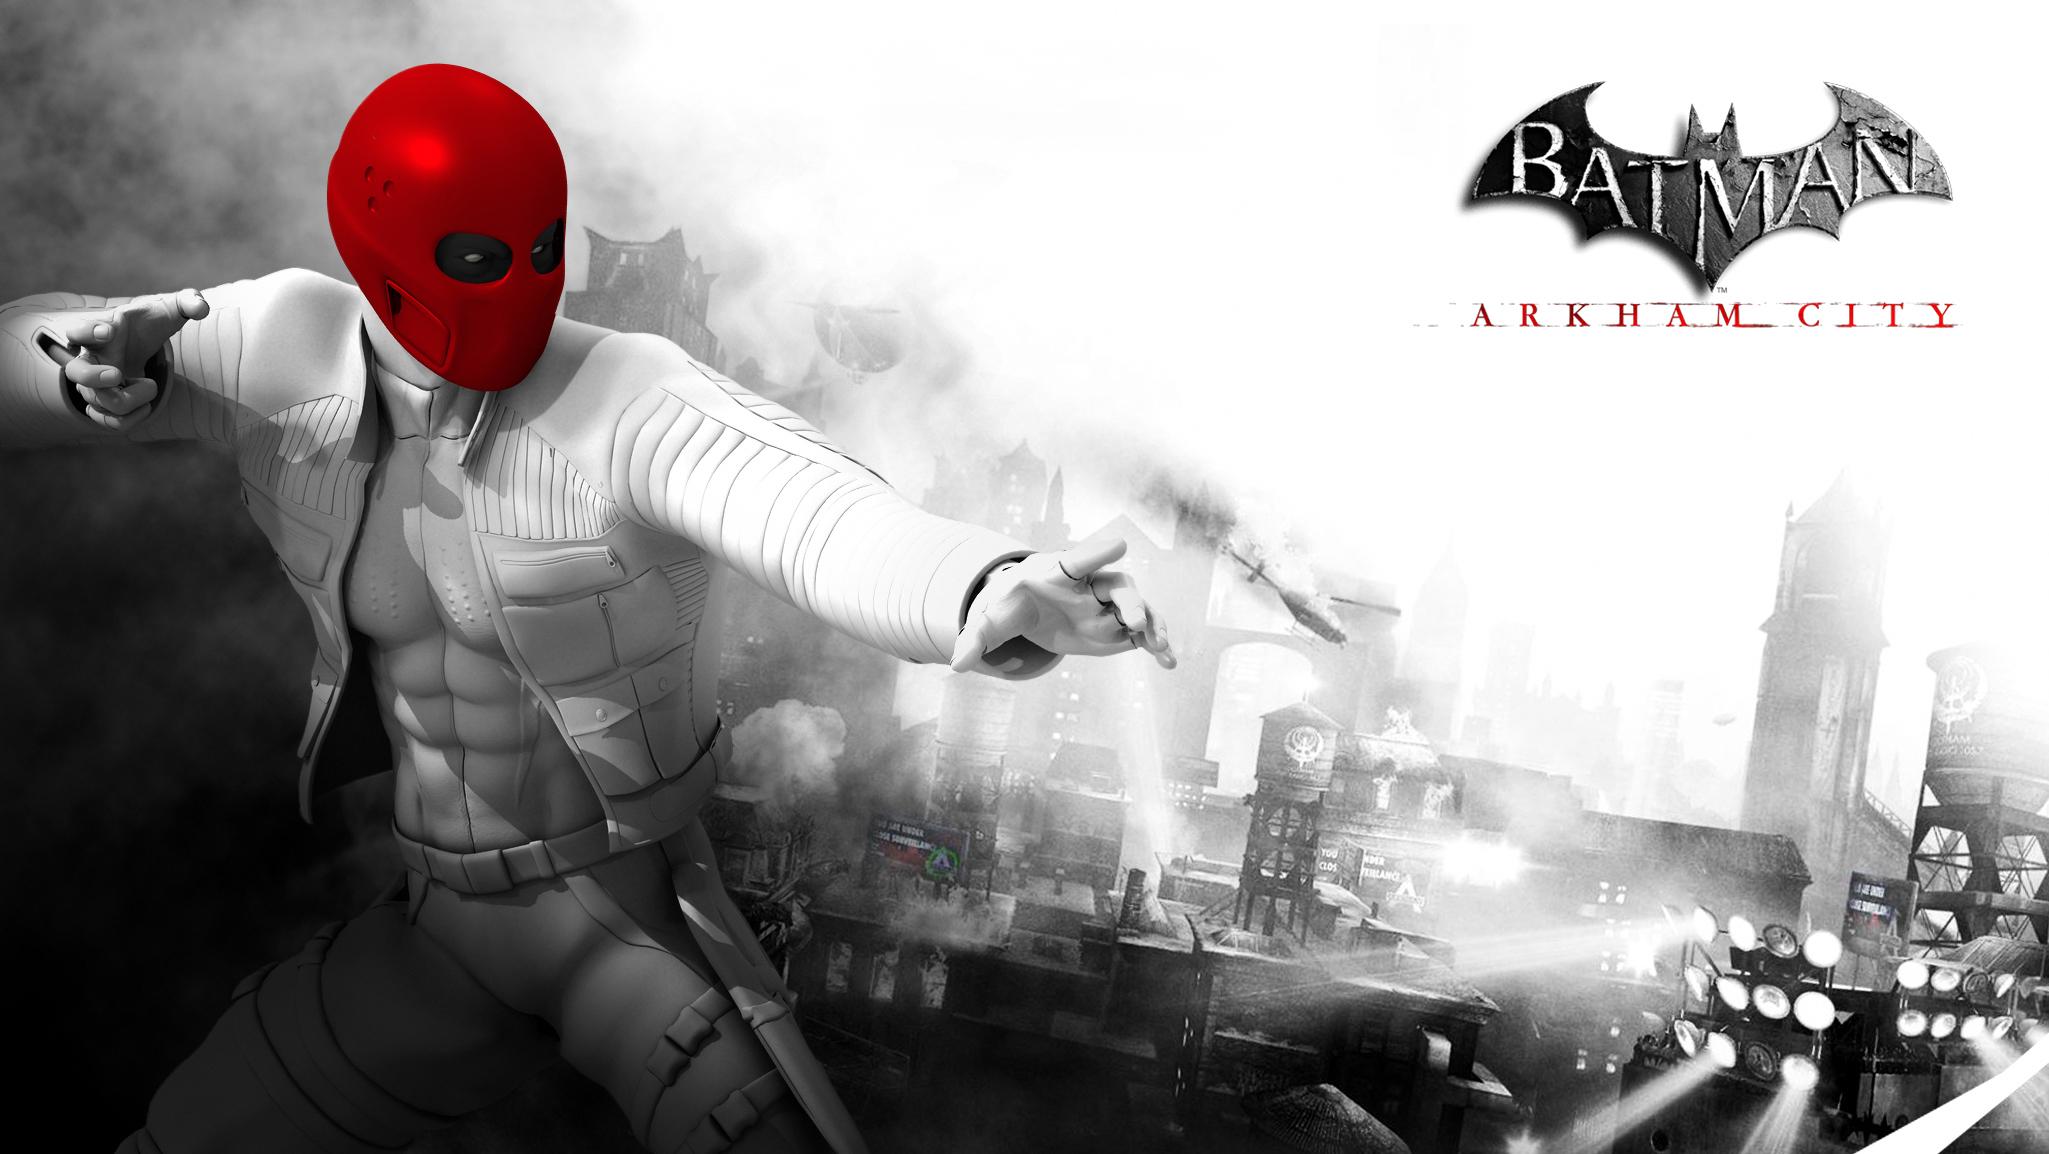 Batman Arkham City Hd Wallpaper Background Image 2049x1154